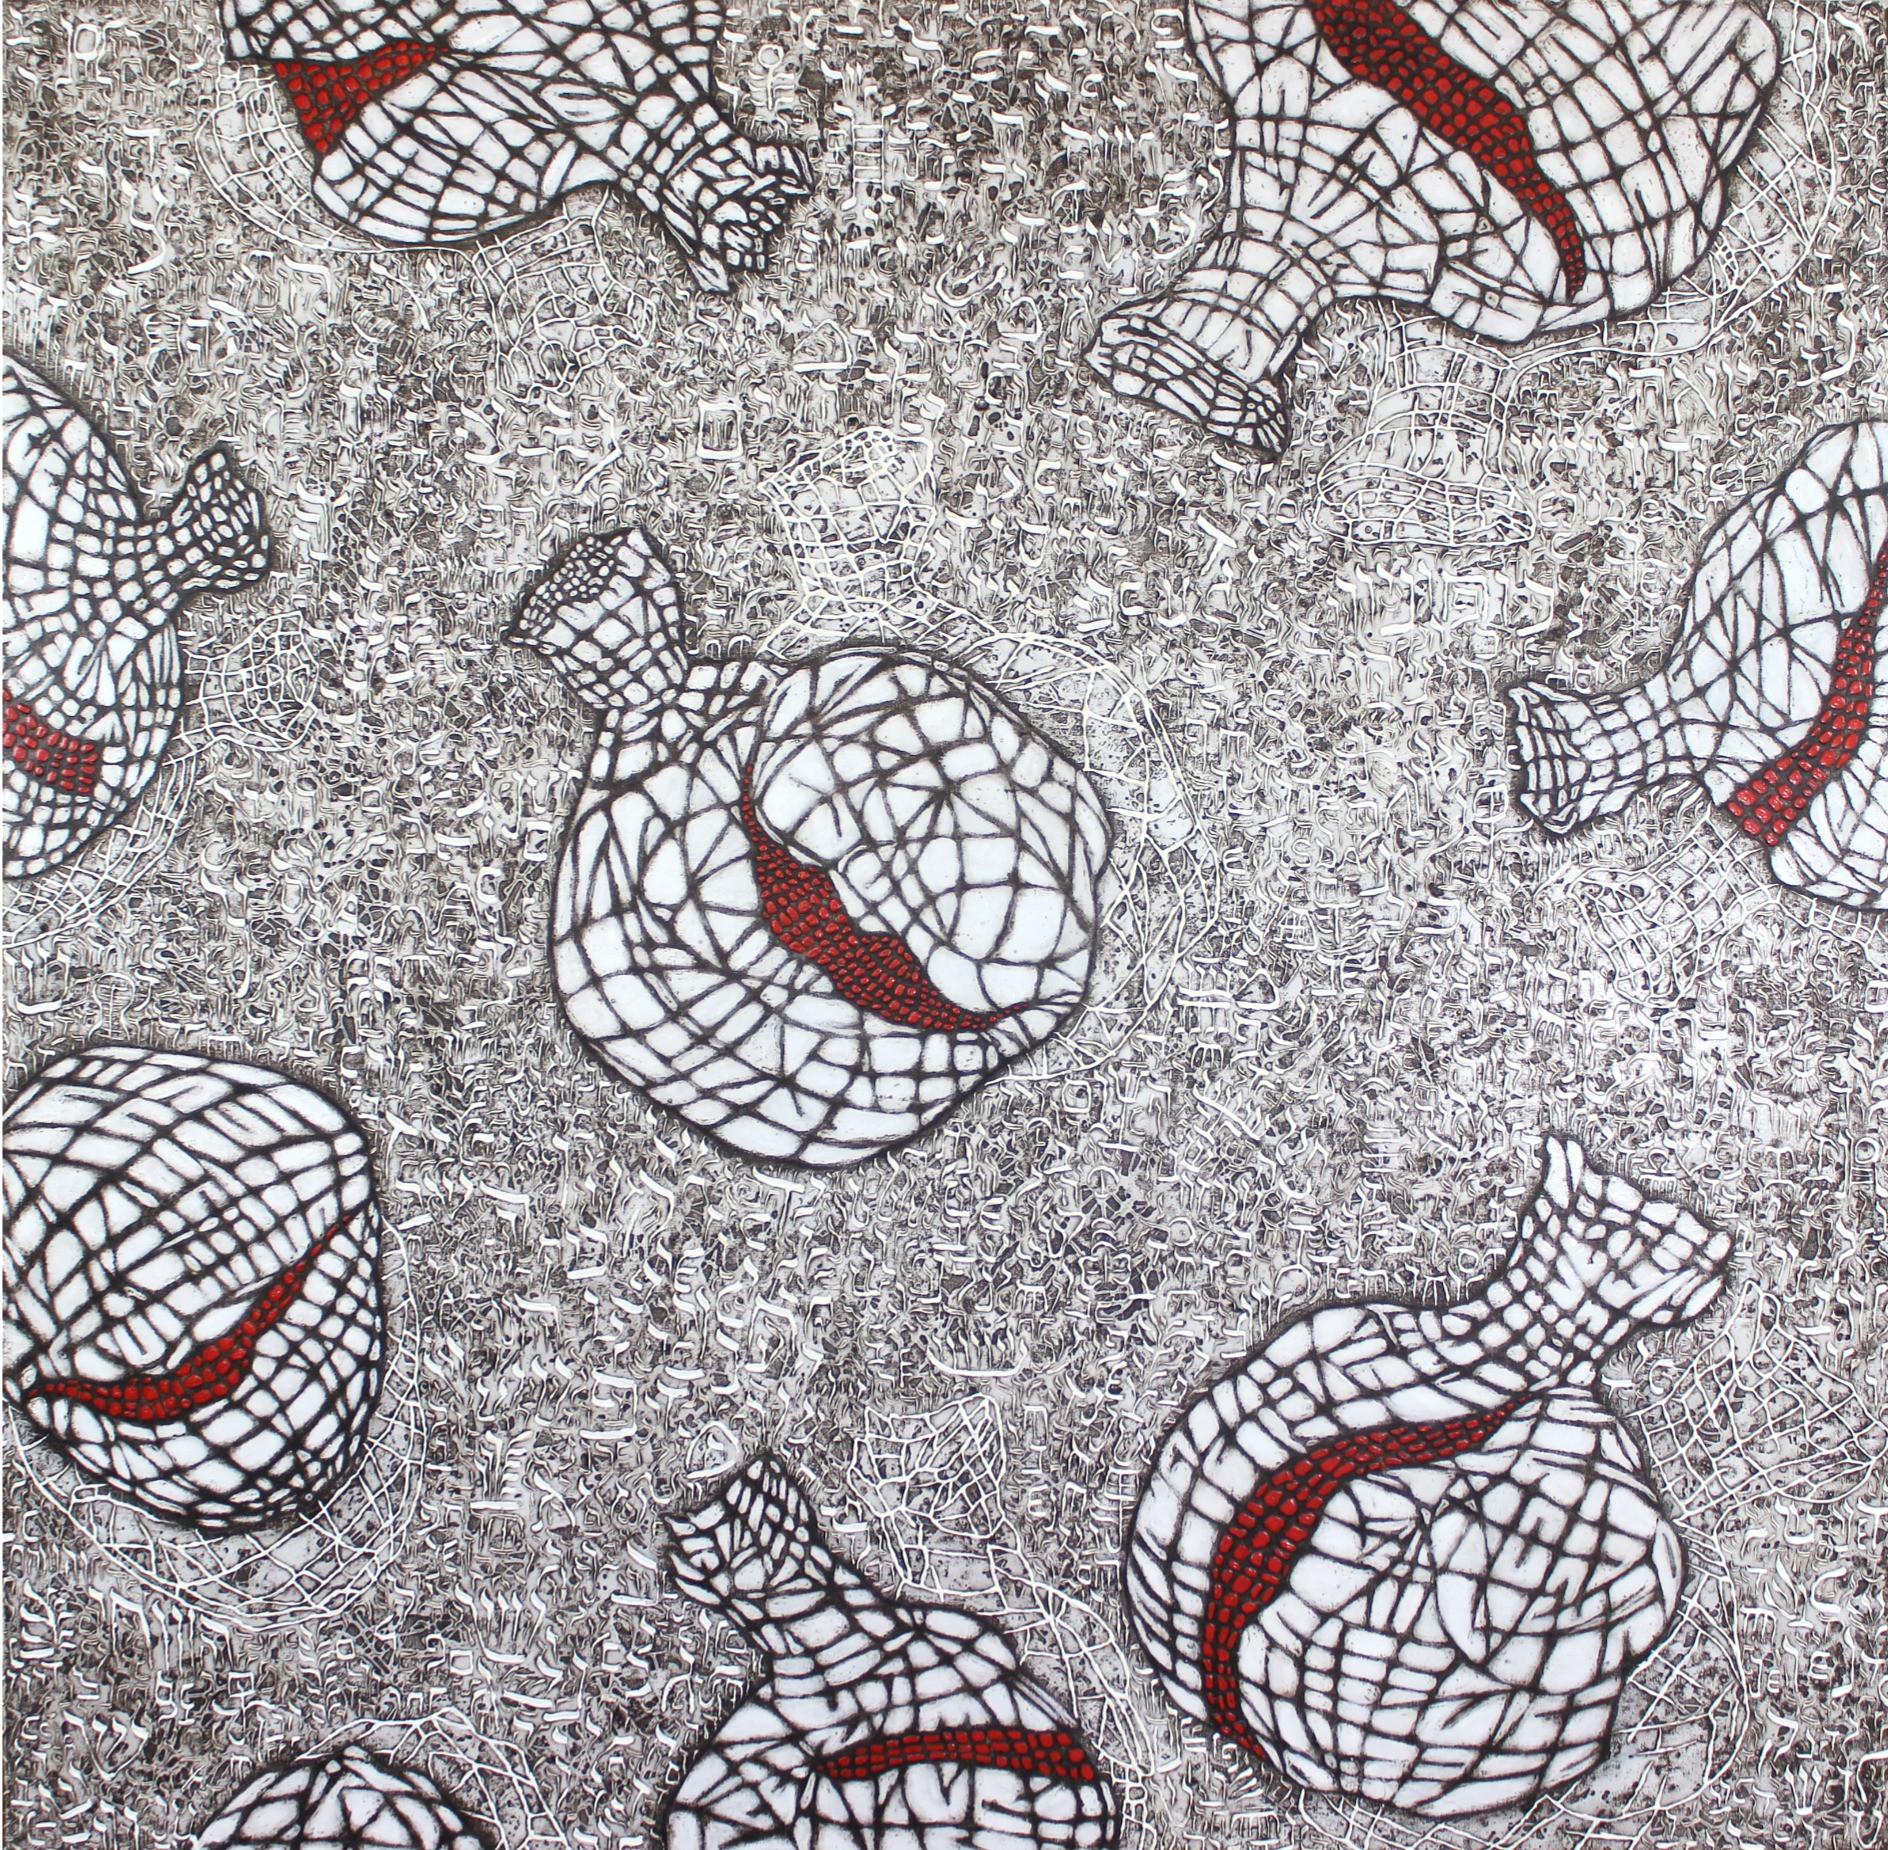 Pomegrante orchard | private collection